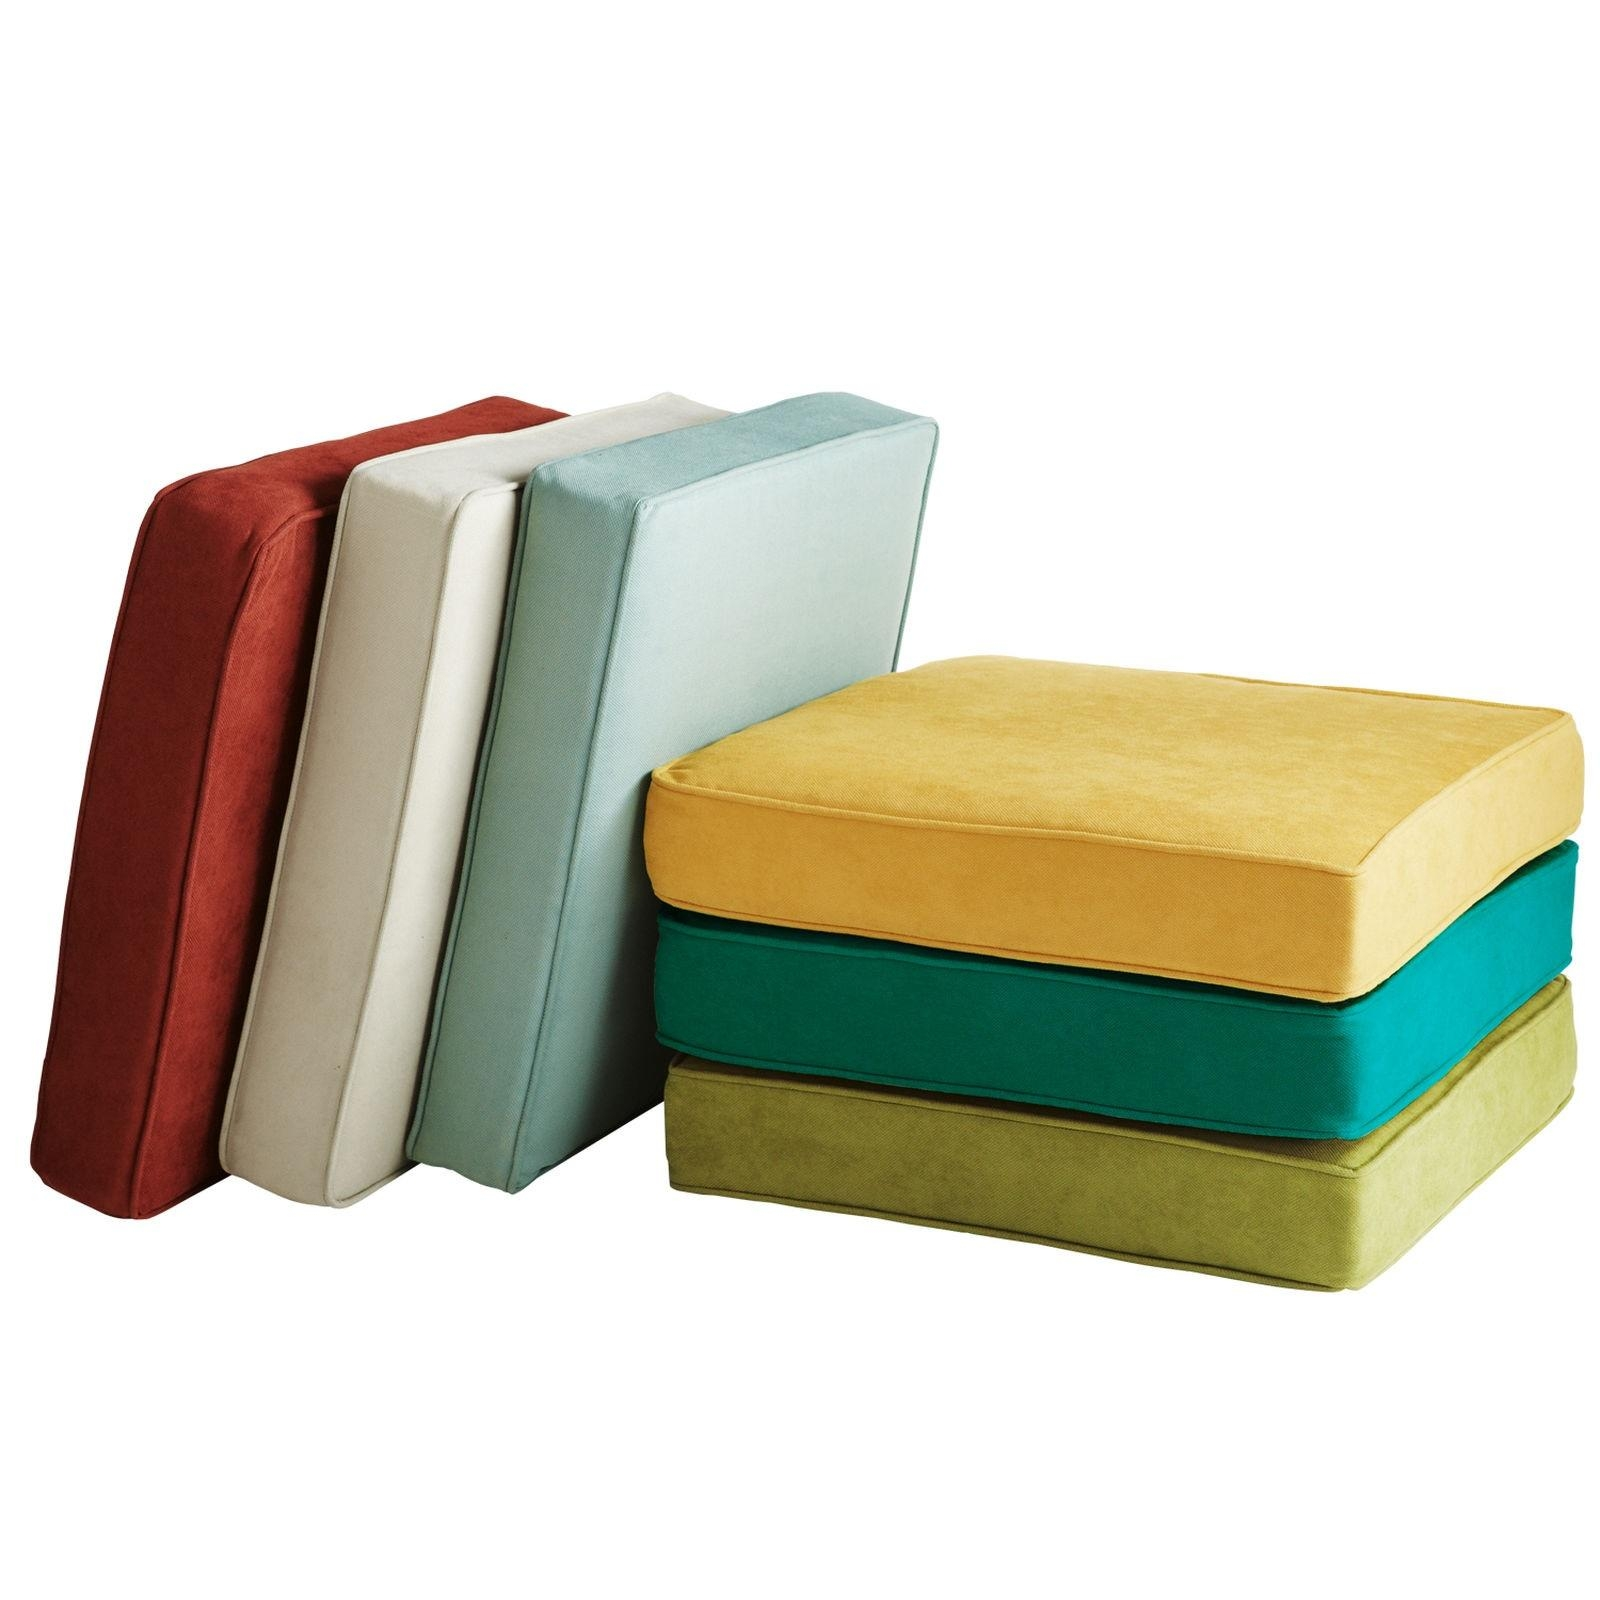 Furniture: Replacement Sofa Cushions | Replacement Sofa Cushion For Sofa Cushions (View 12 of 21)